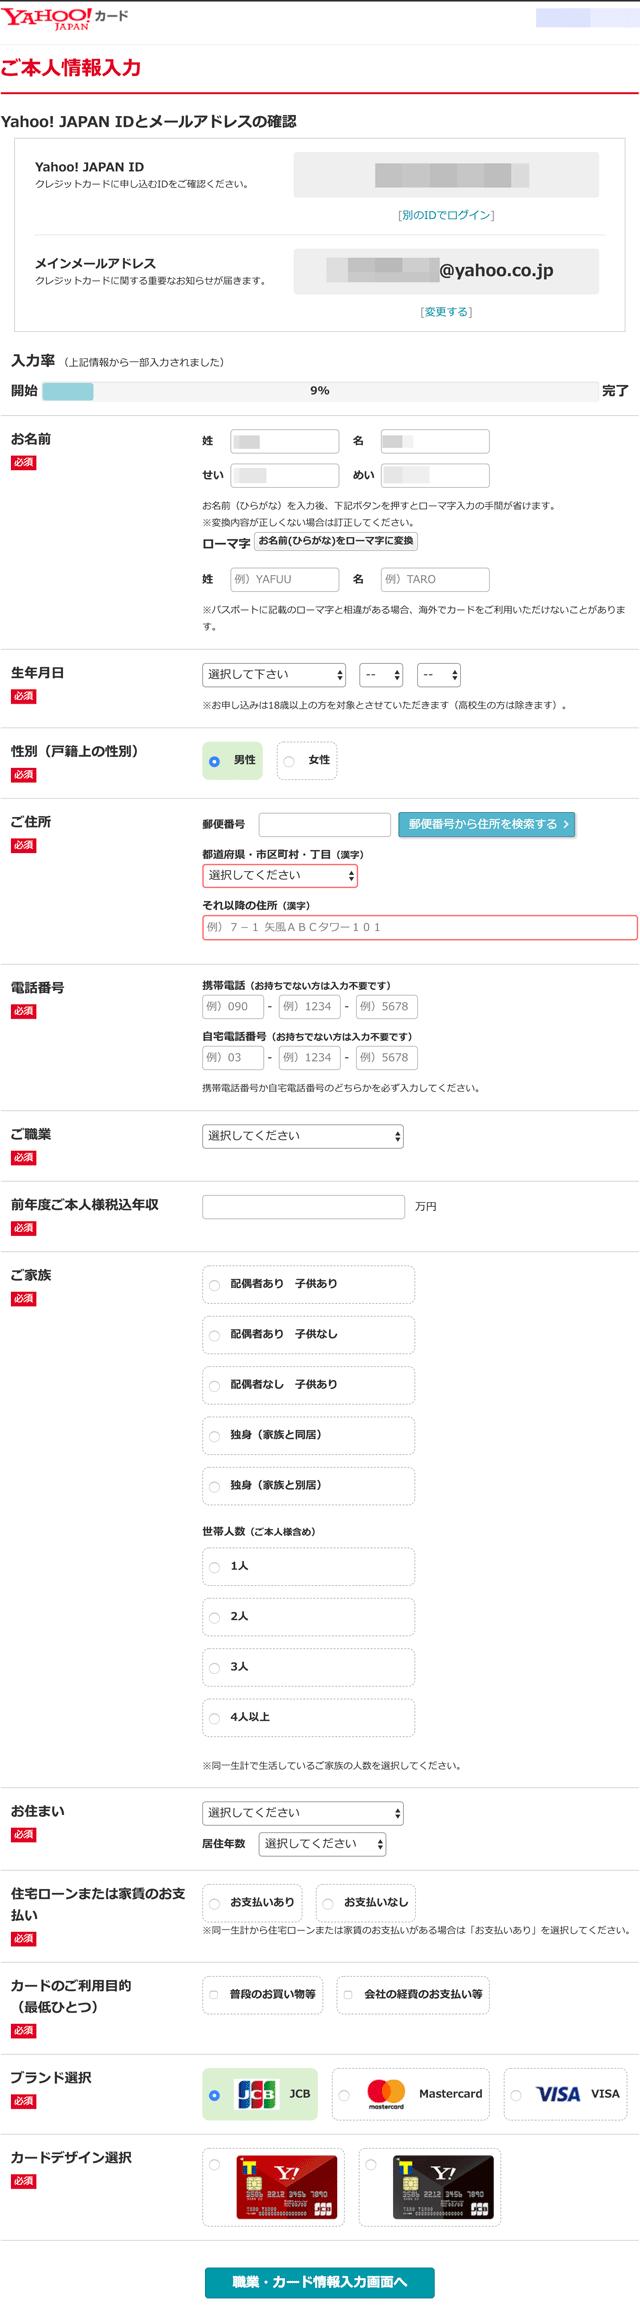 Yahoo! JAPANカード申し込みに必要な個人情報入力画面